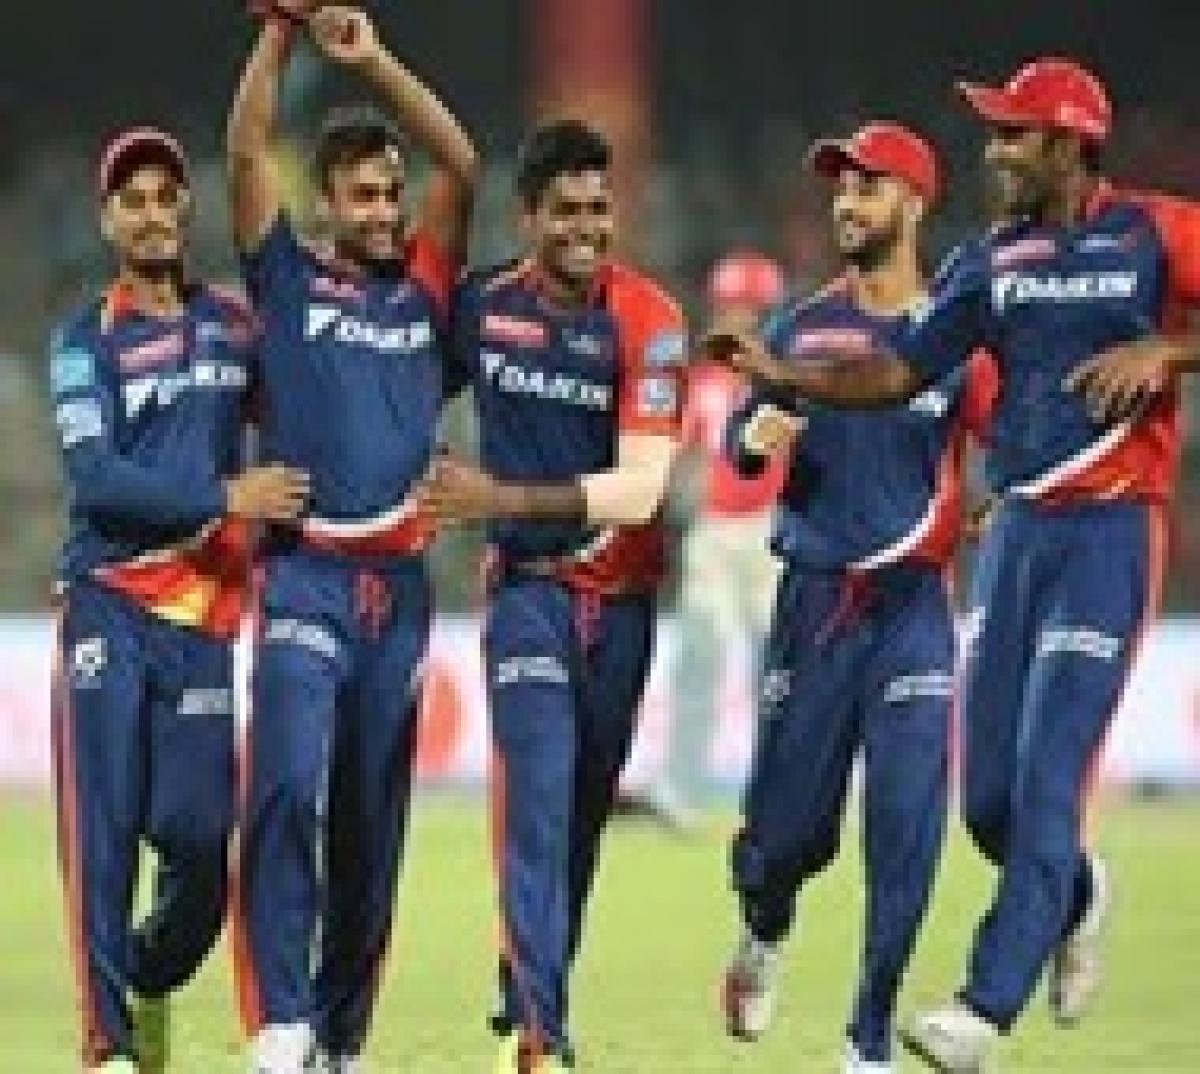 IPL: Delhi aim for redemption against Pune